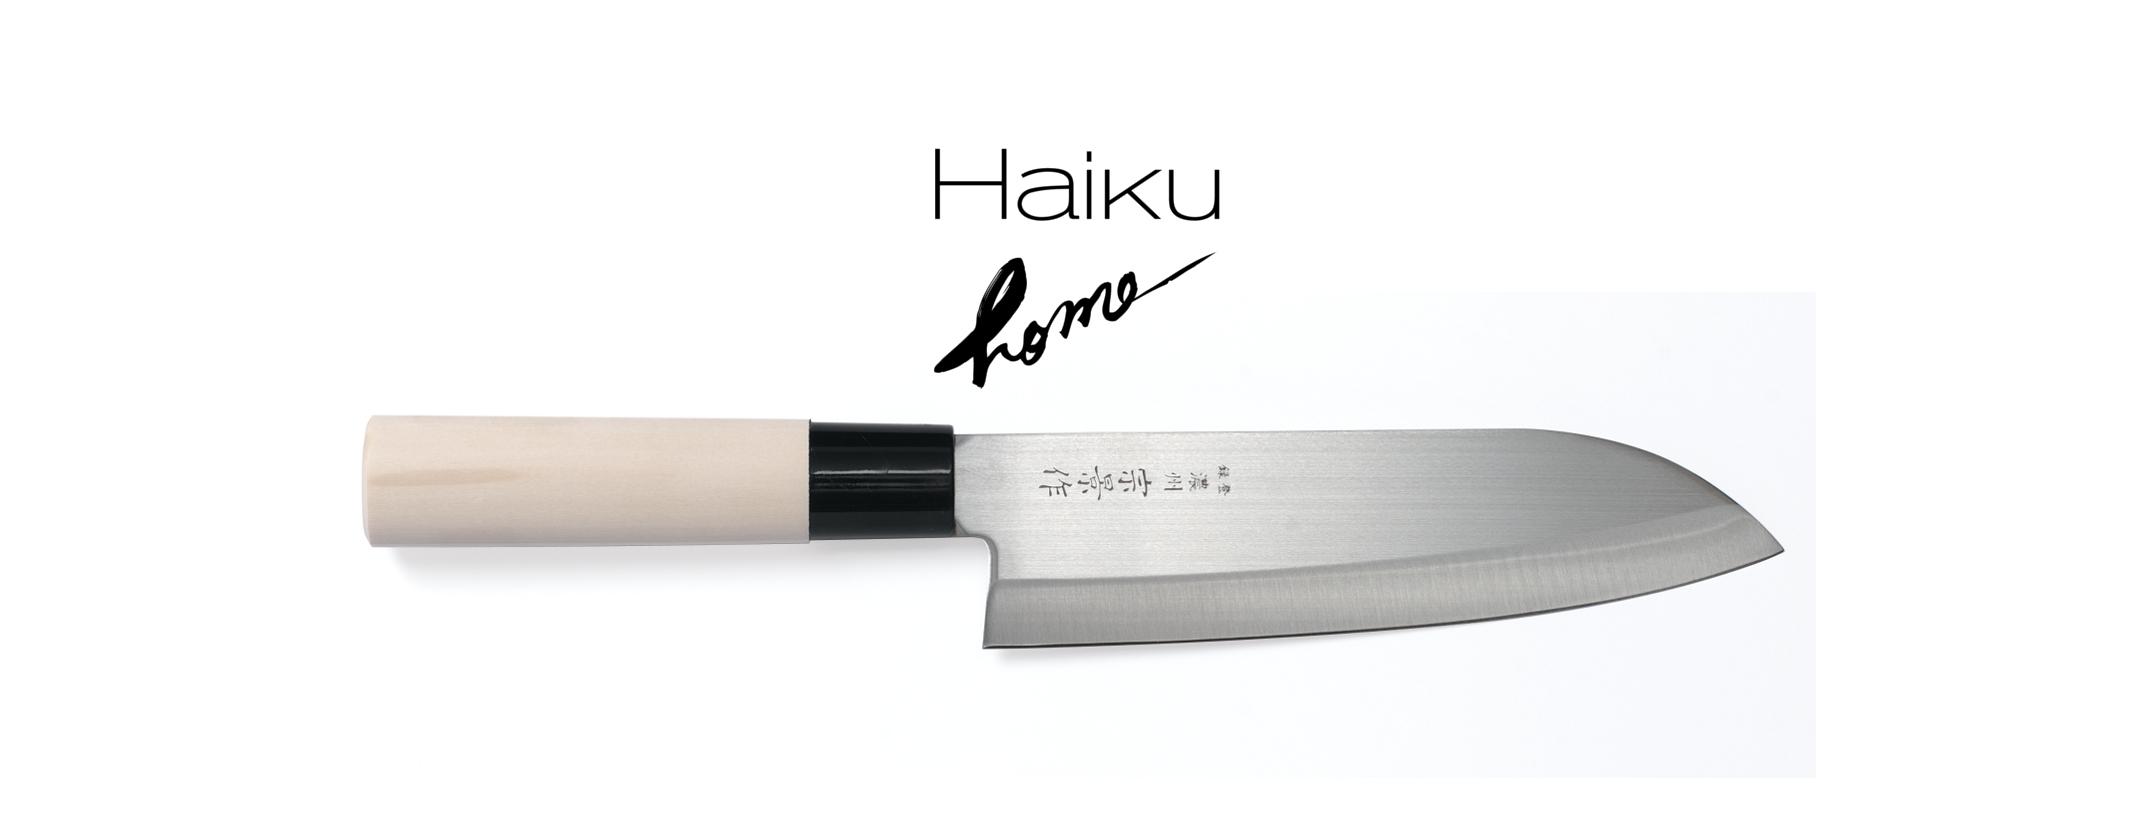 CHROMA-Haiku-home-Serie